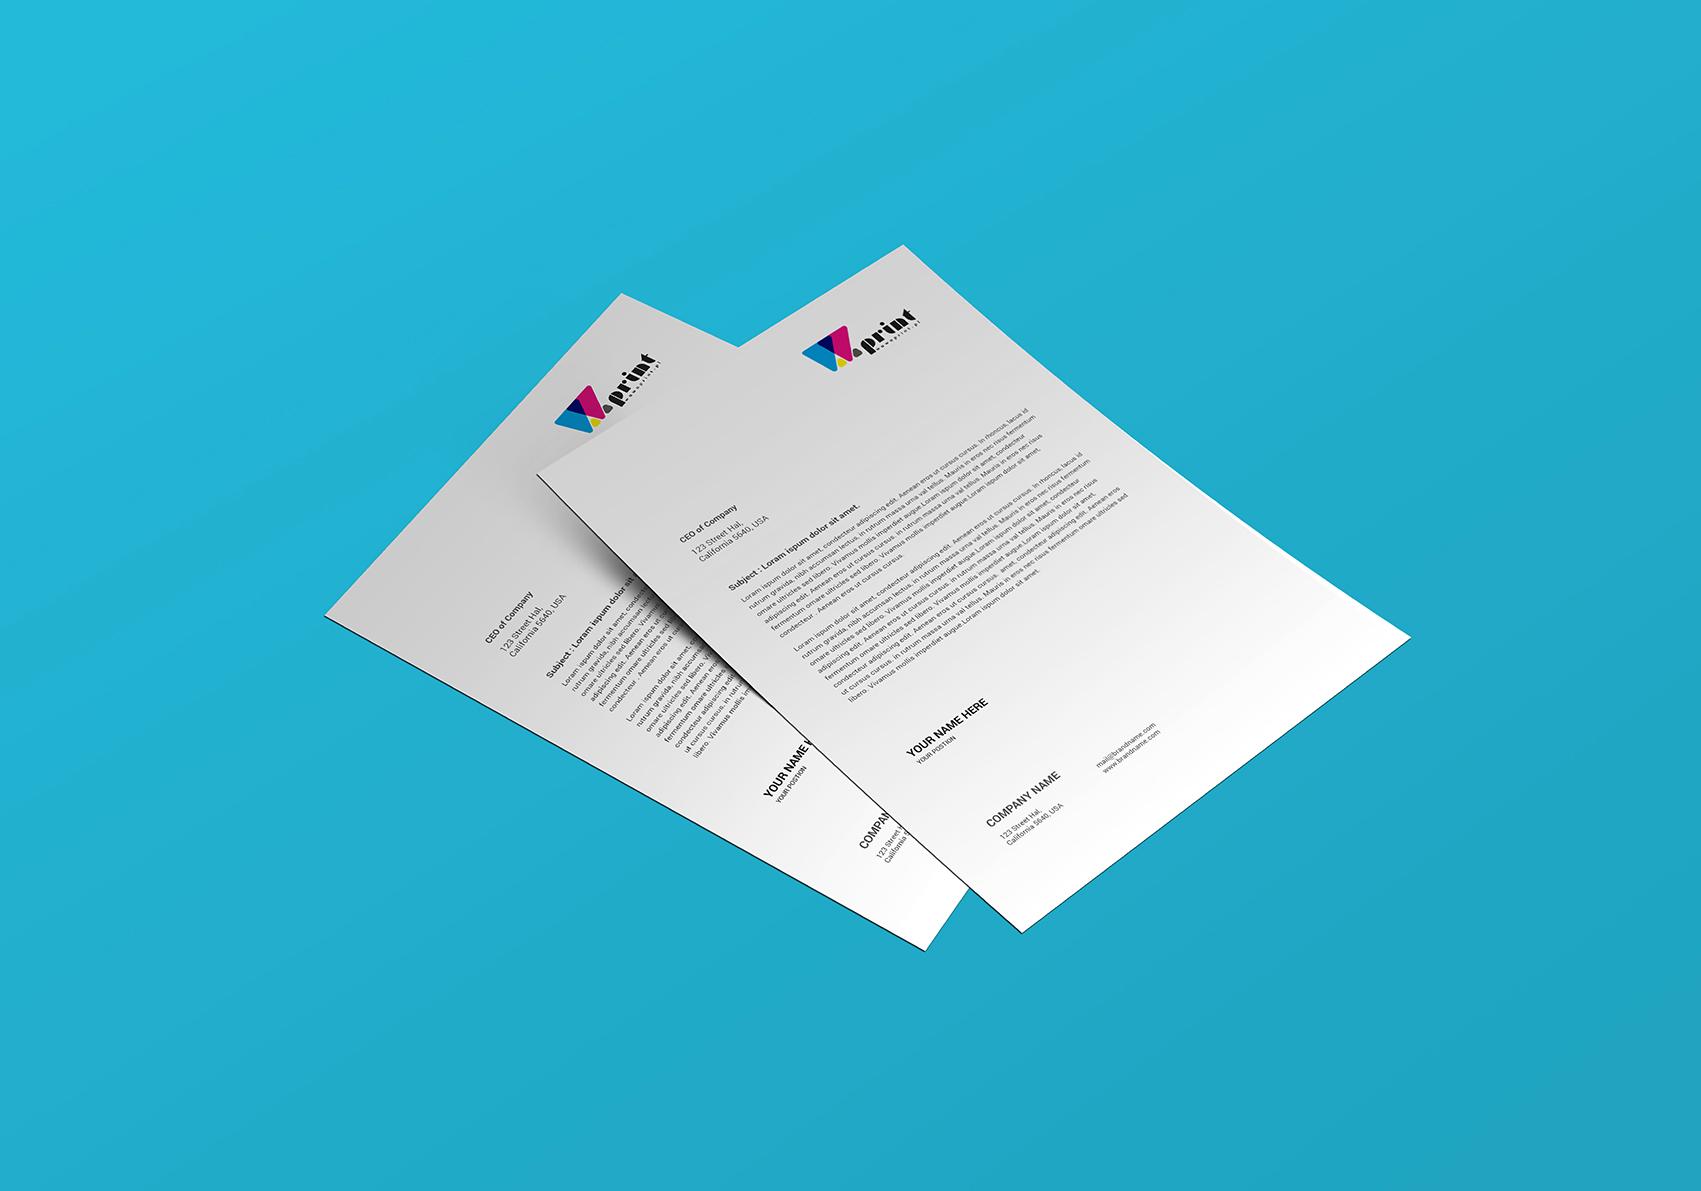 Papier firmowy_image3